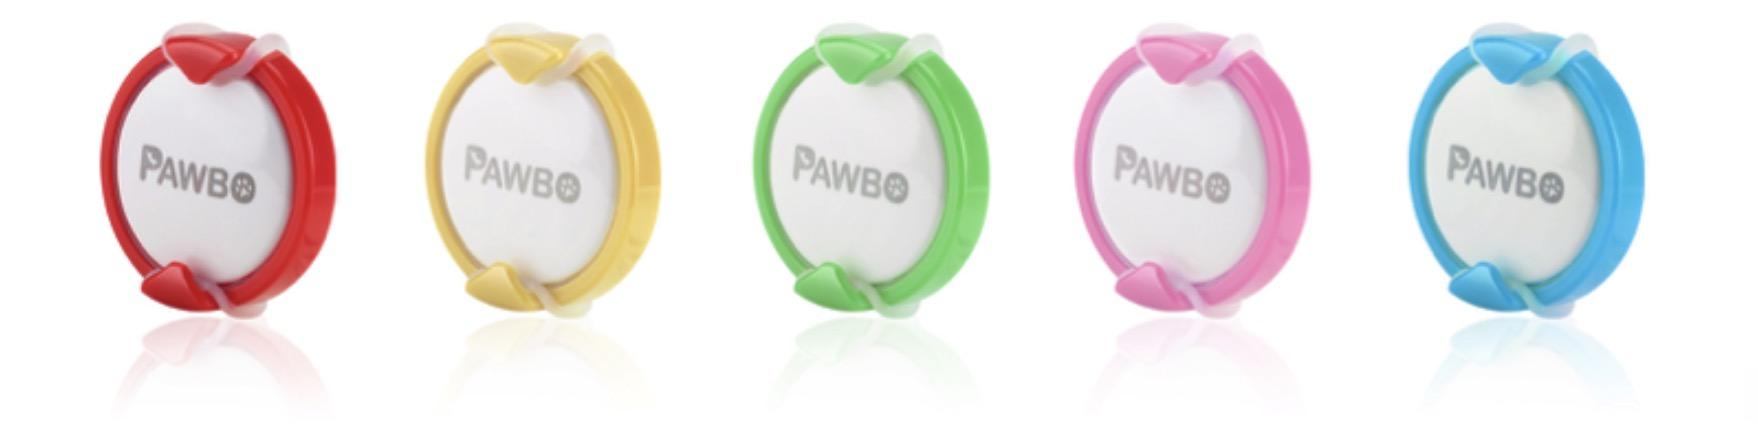 pawbo-ipuppy-go-chine-chait-iot-smart-home